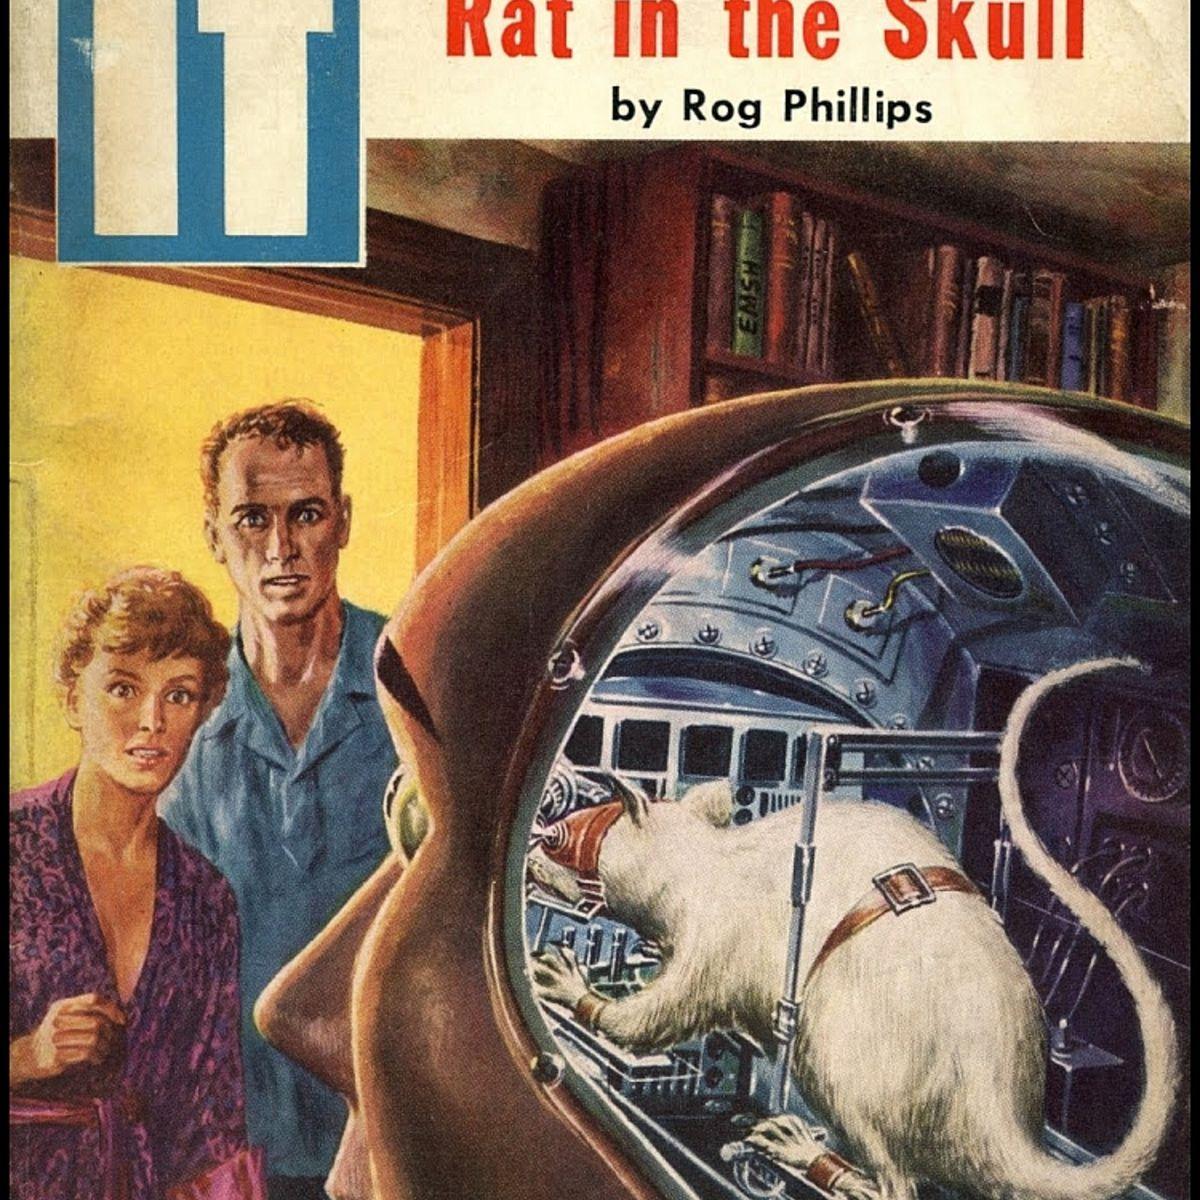 if-science-fiction-magazine-rat-in-the-skull.jpg